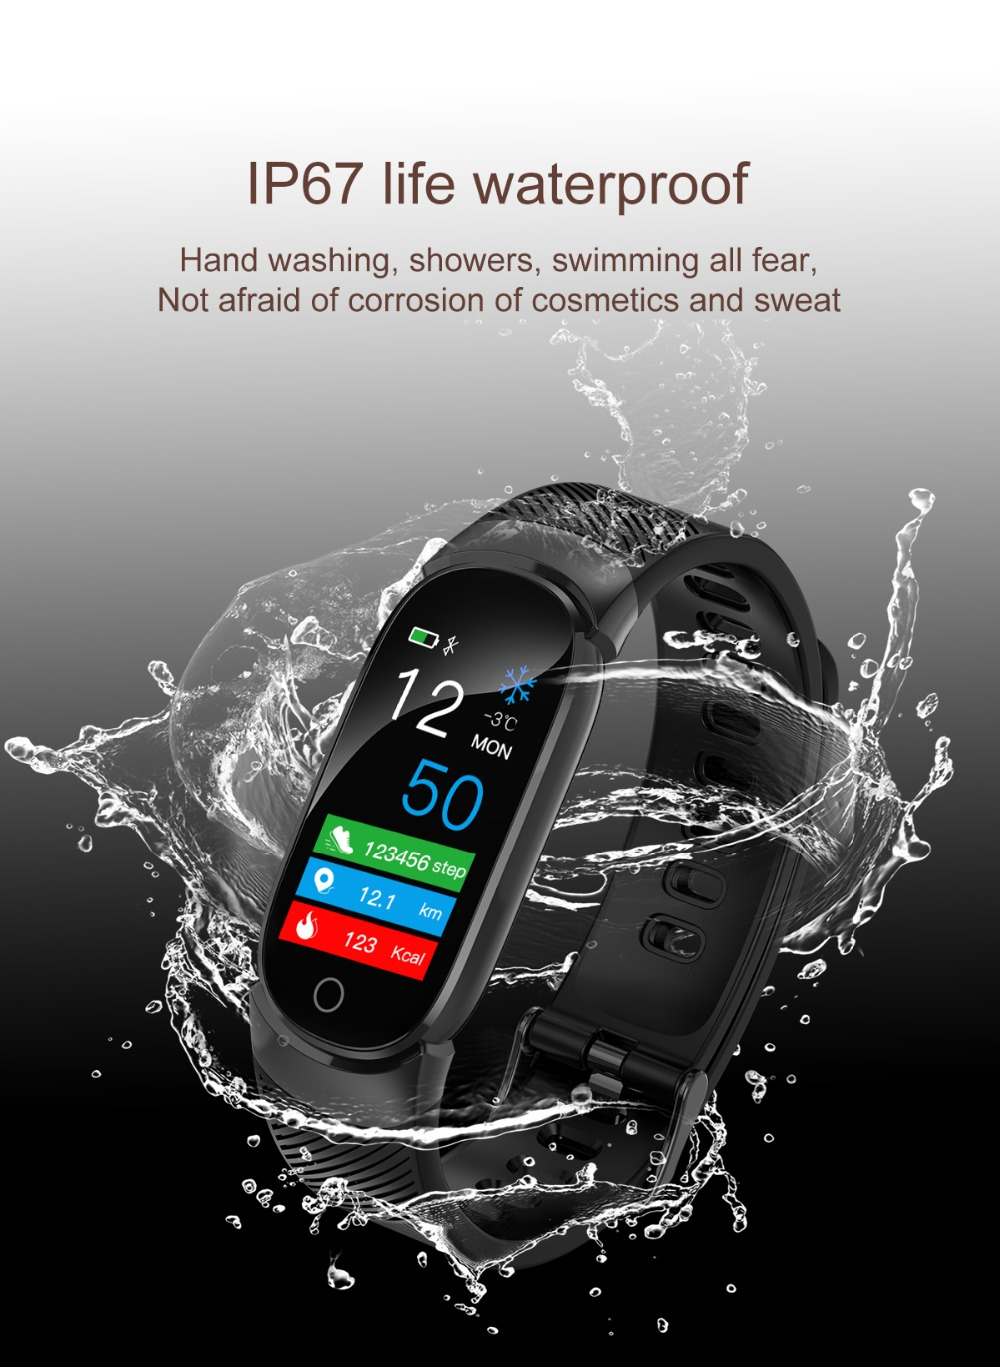 HTB112jvdLWG3KVjSZPcq6zkbXXaU QW16 Waterproof Smart Bracelet Smart Band IP67 Heart Rate Fitness Tracker Blood Pressure smart watch